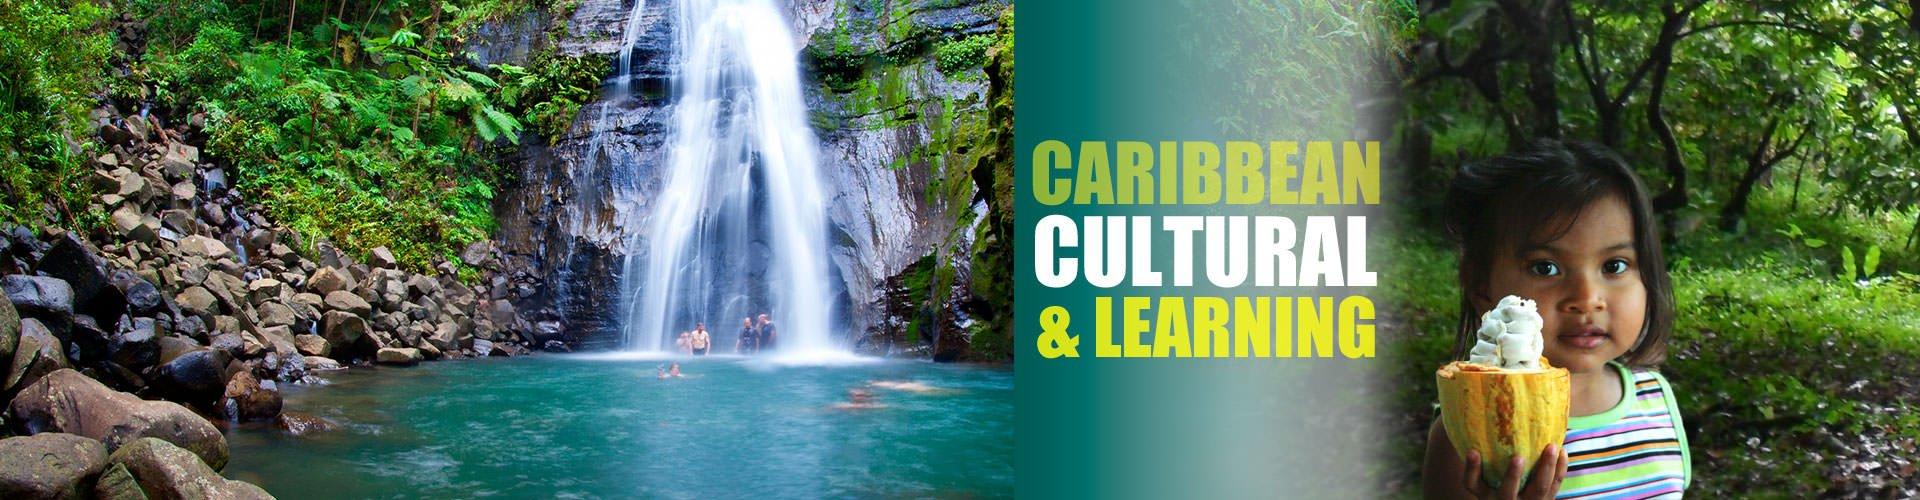 Caribbean Cultural & Learning